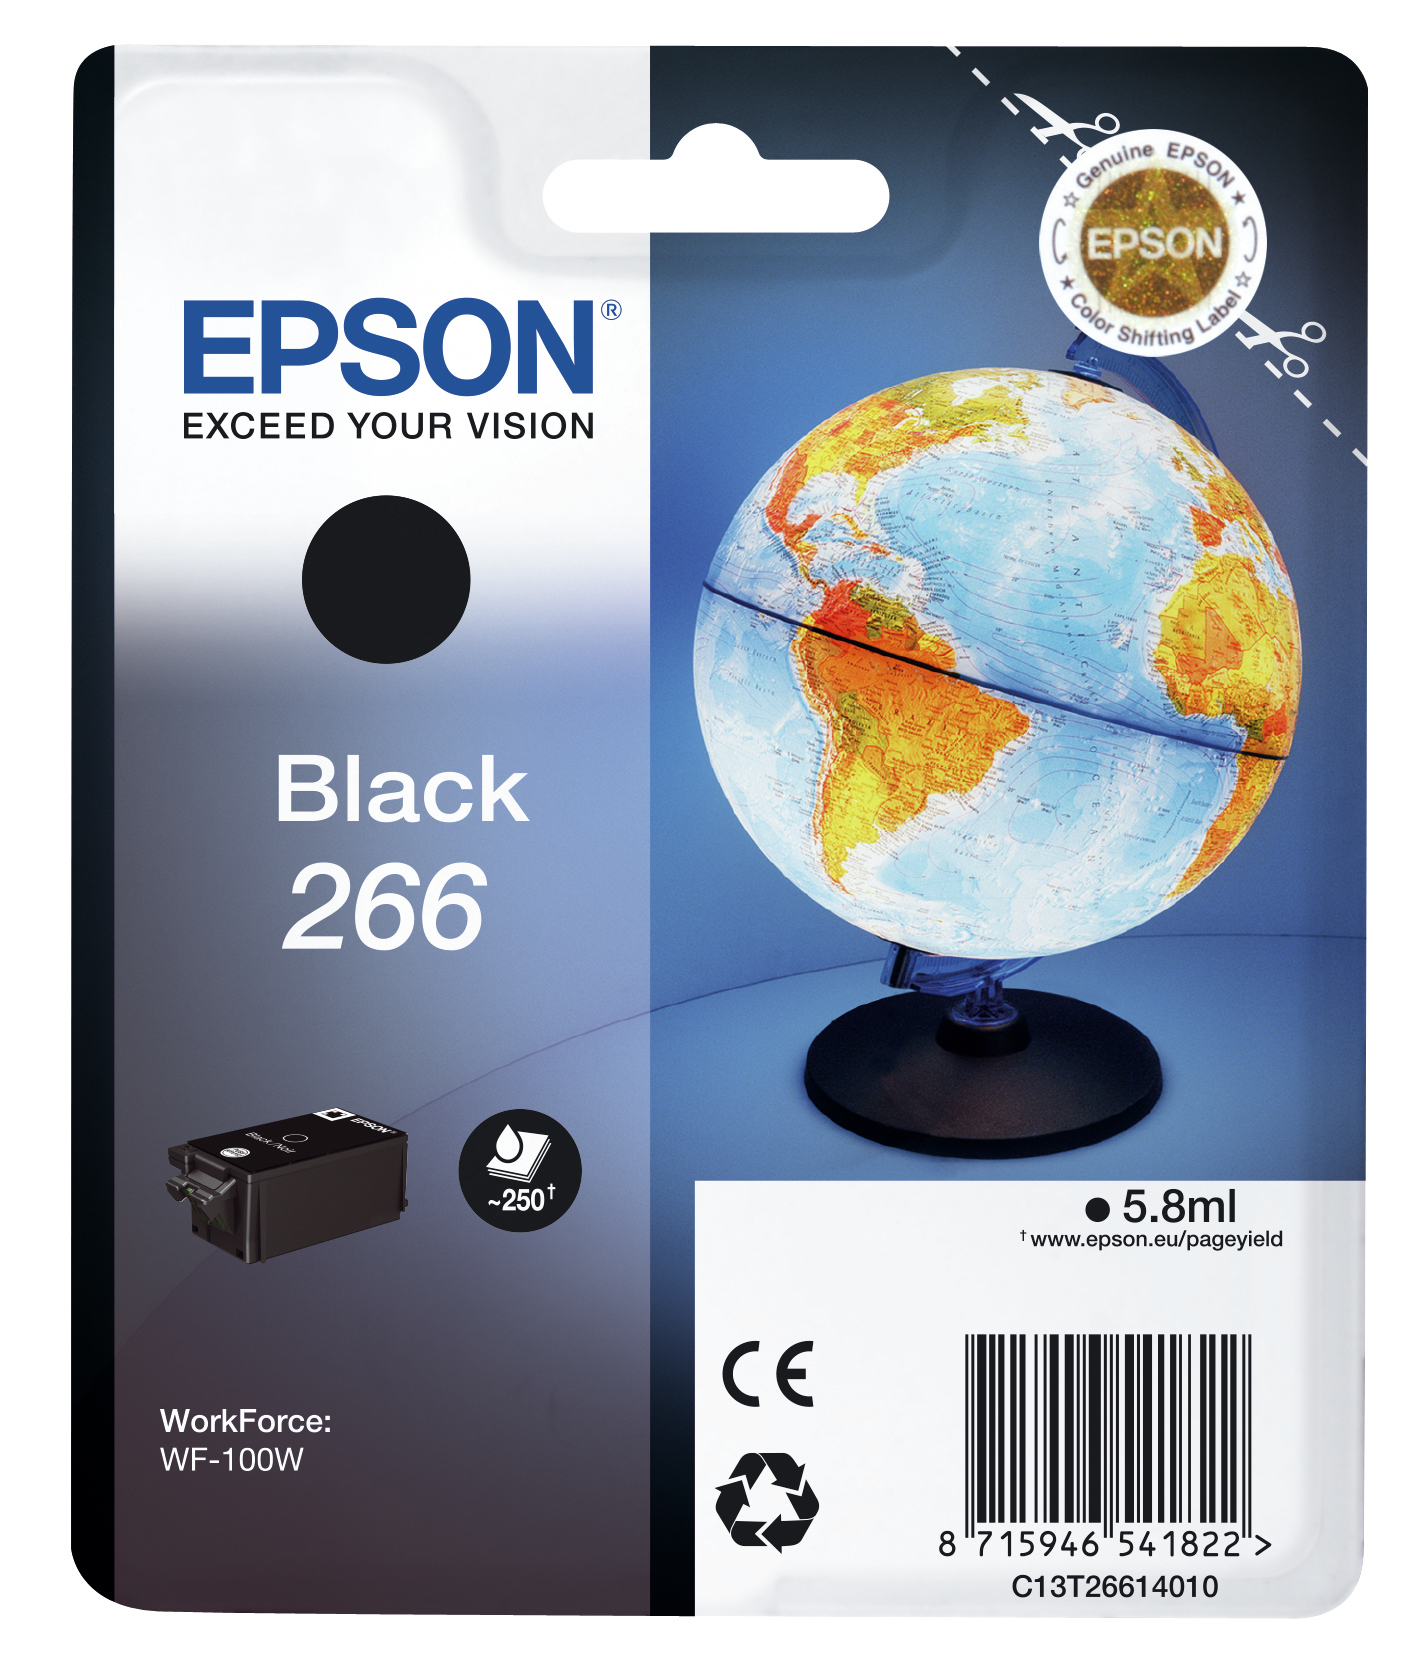 Epson Globe Singlepack Black 266 ink cartridge